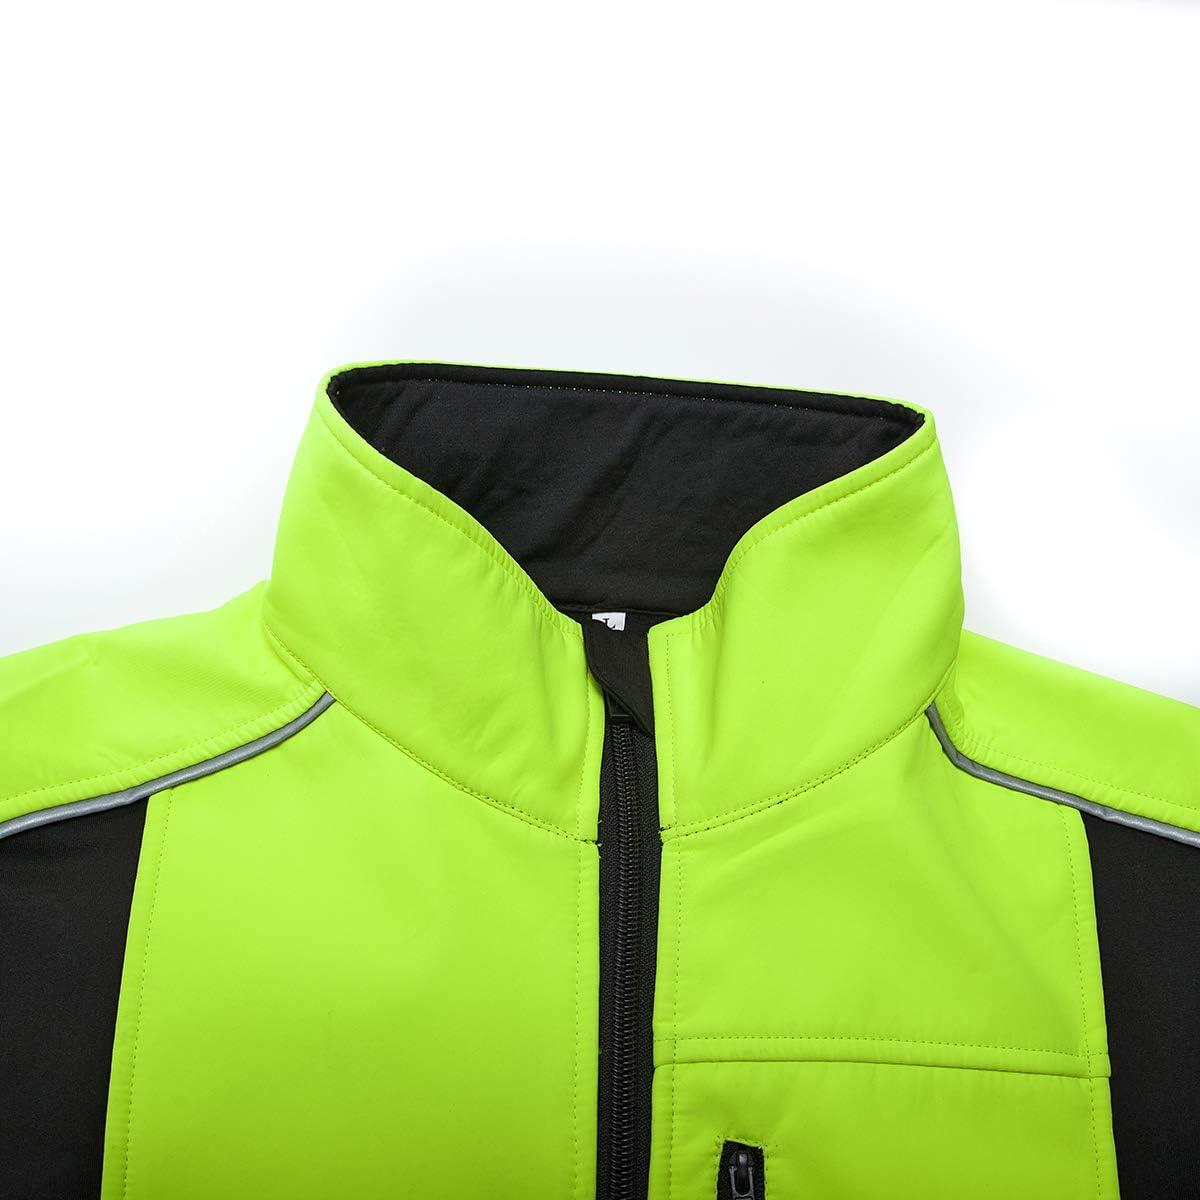 Herren Fahrradjacke Fahrrad Winter Fleece Jacke Top Warm Winddicht Fleece Futter Sport MTB Rennrad Radbekleidung